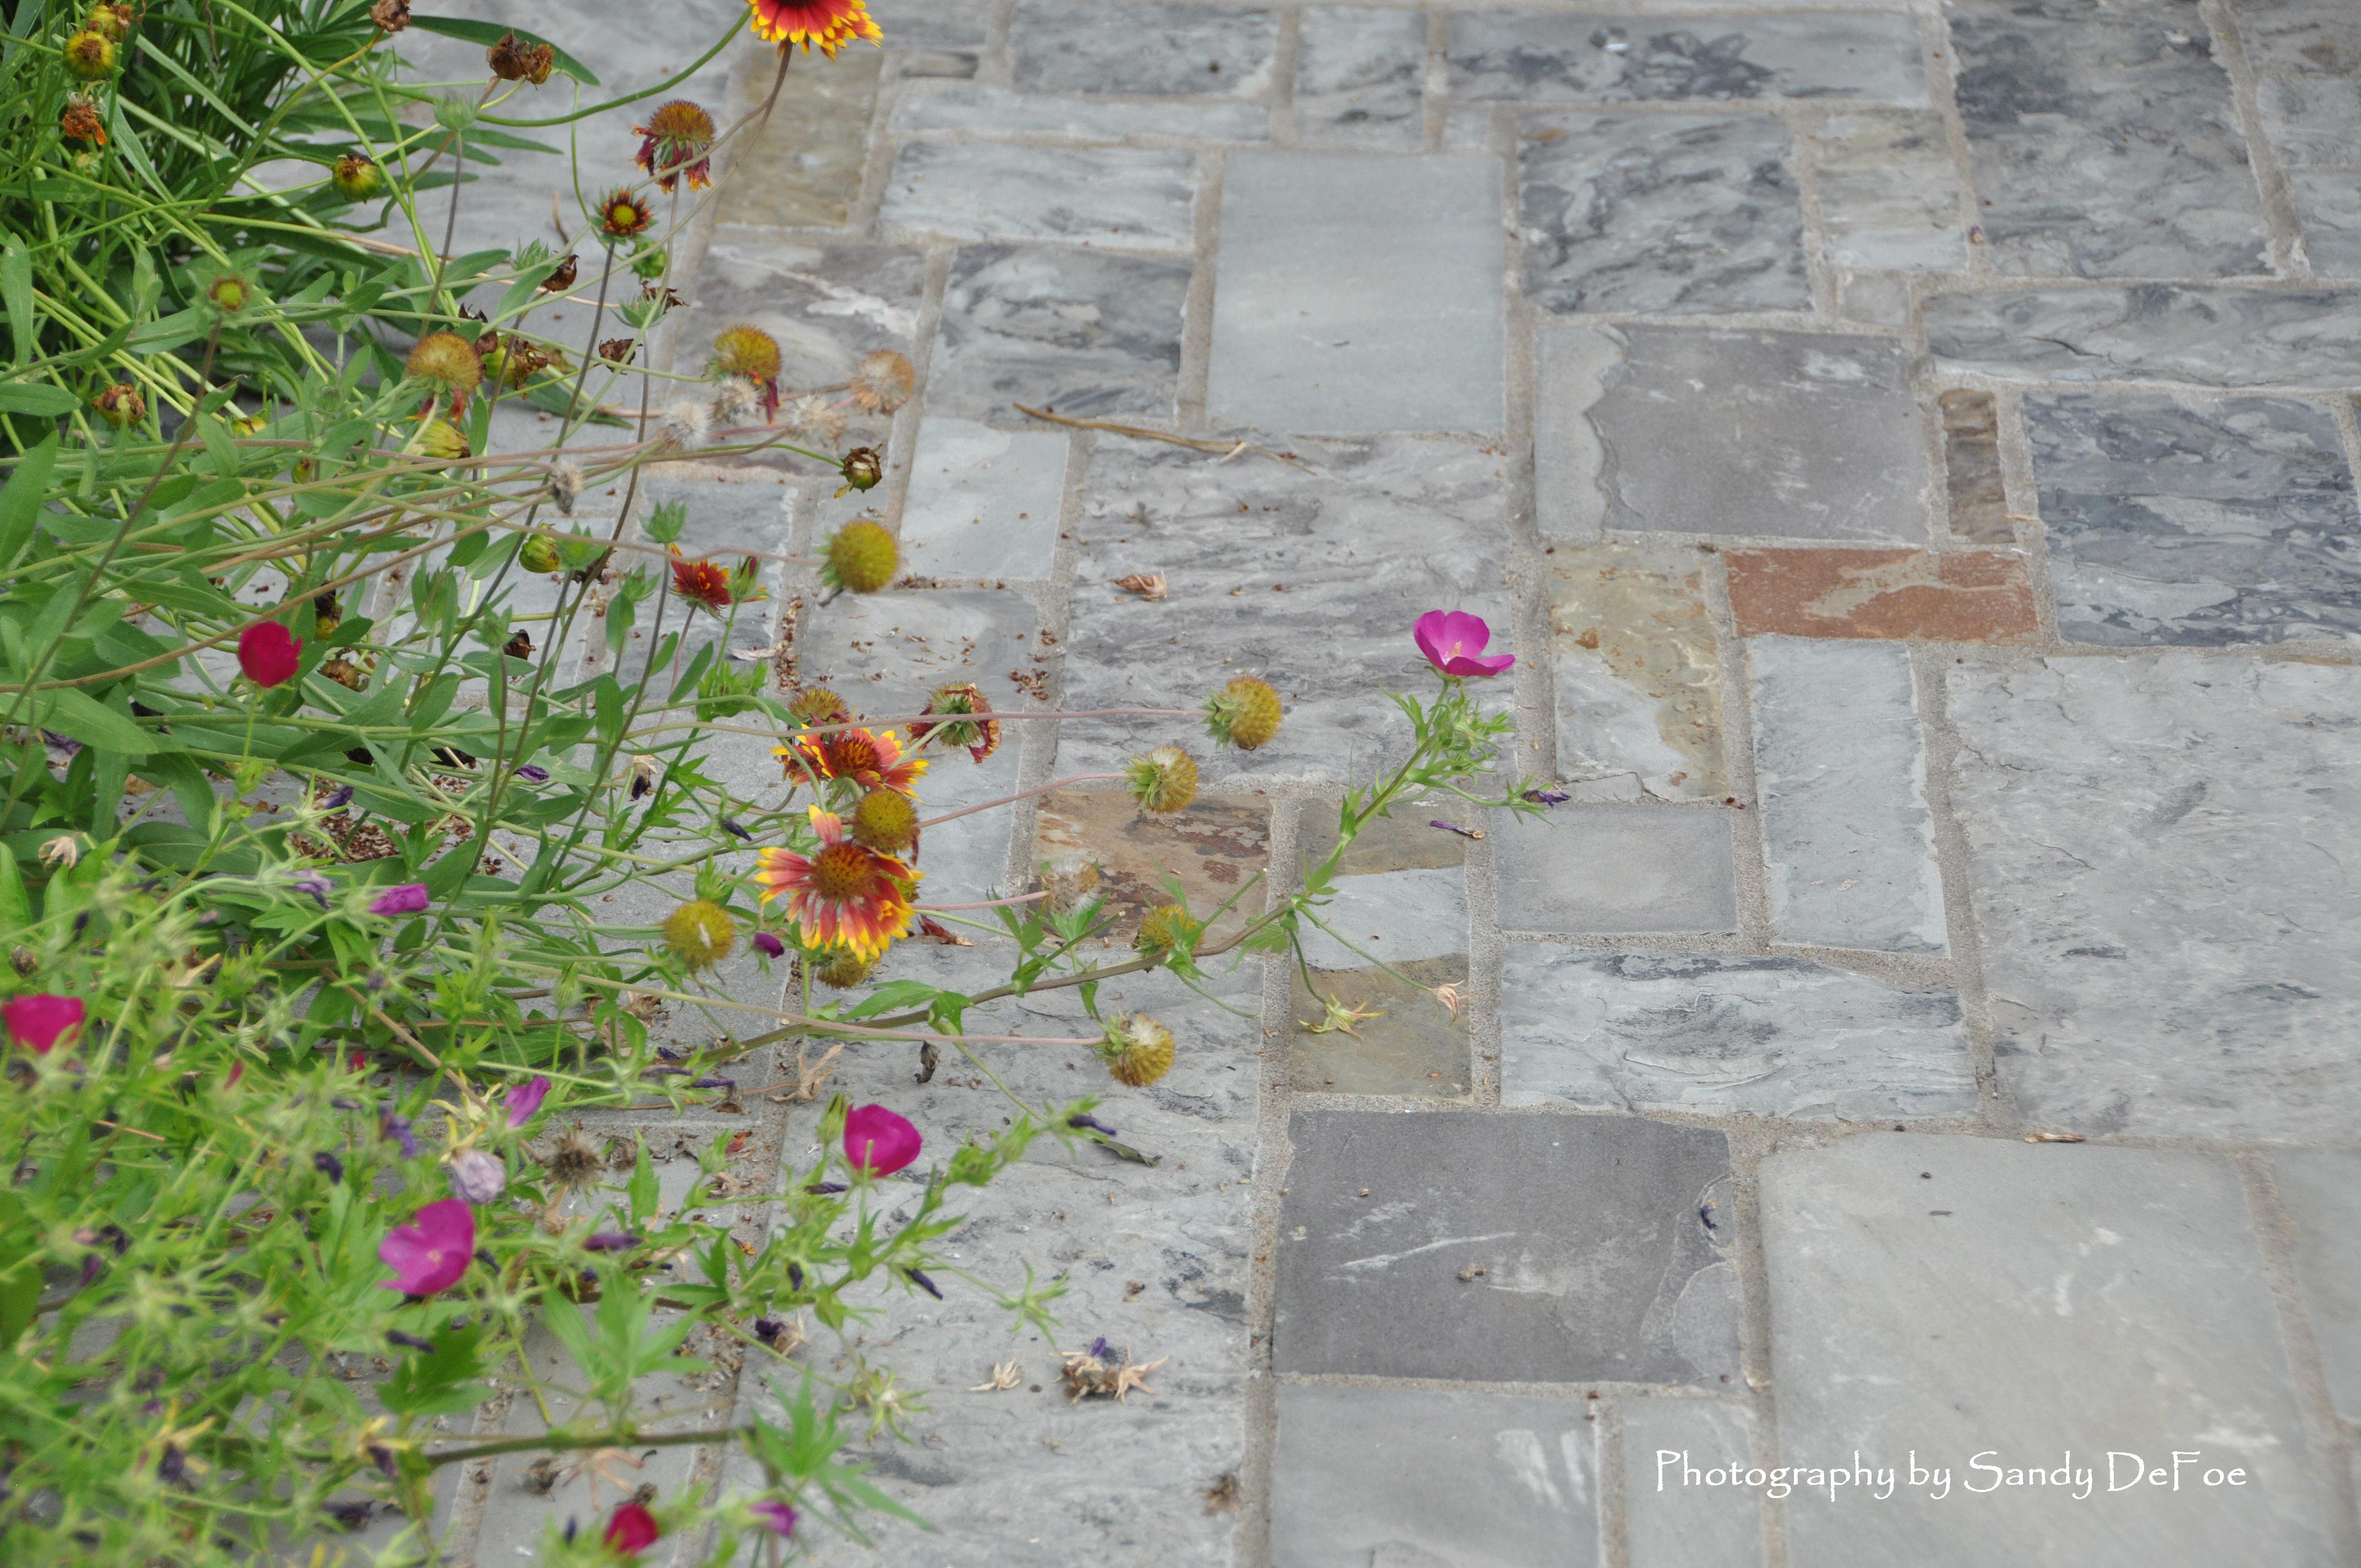 groundcovers on sidewalk